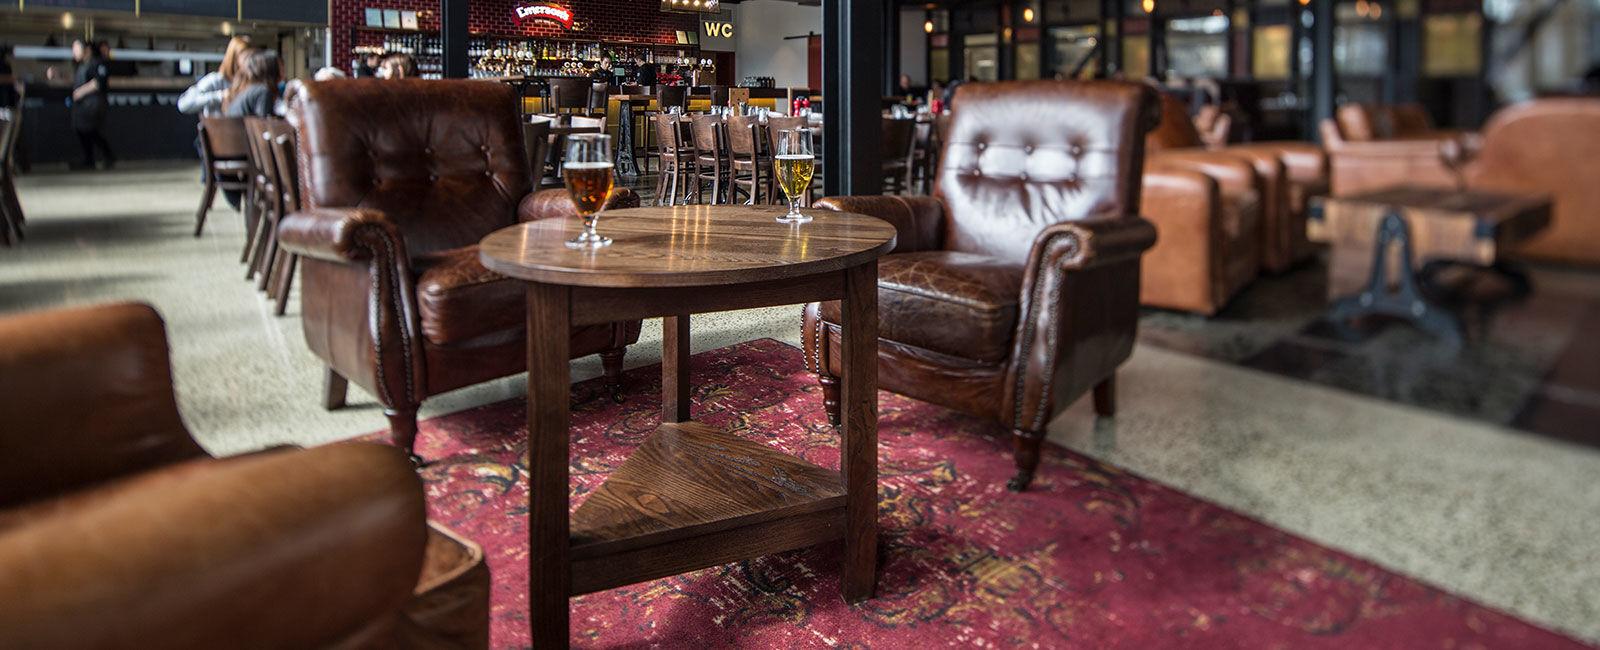 Emmersons Brewery Bar Furniture